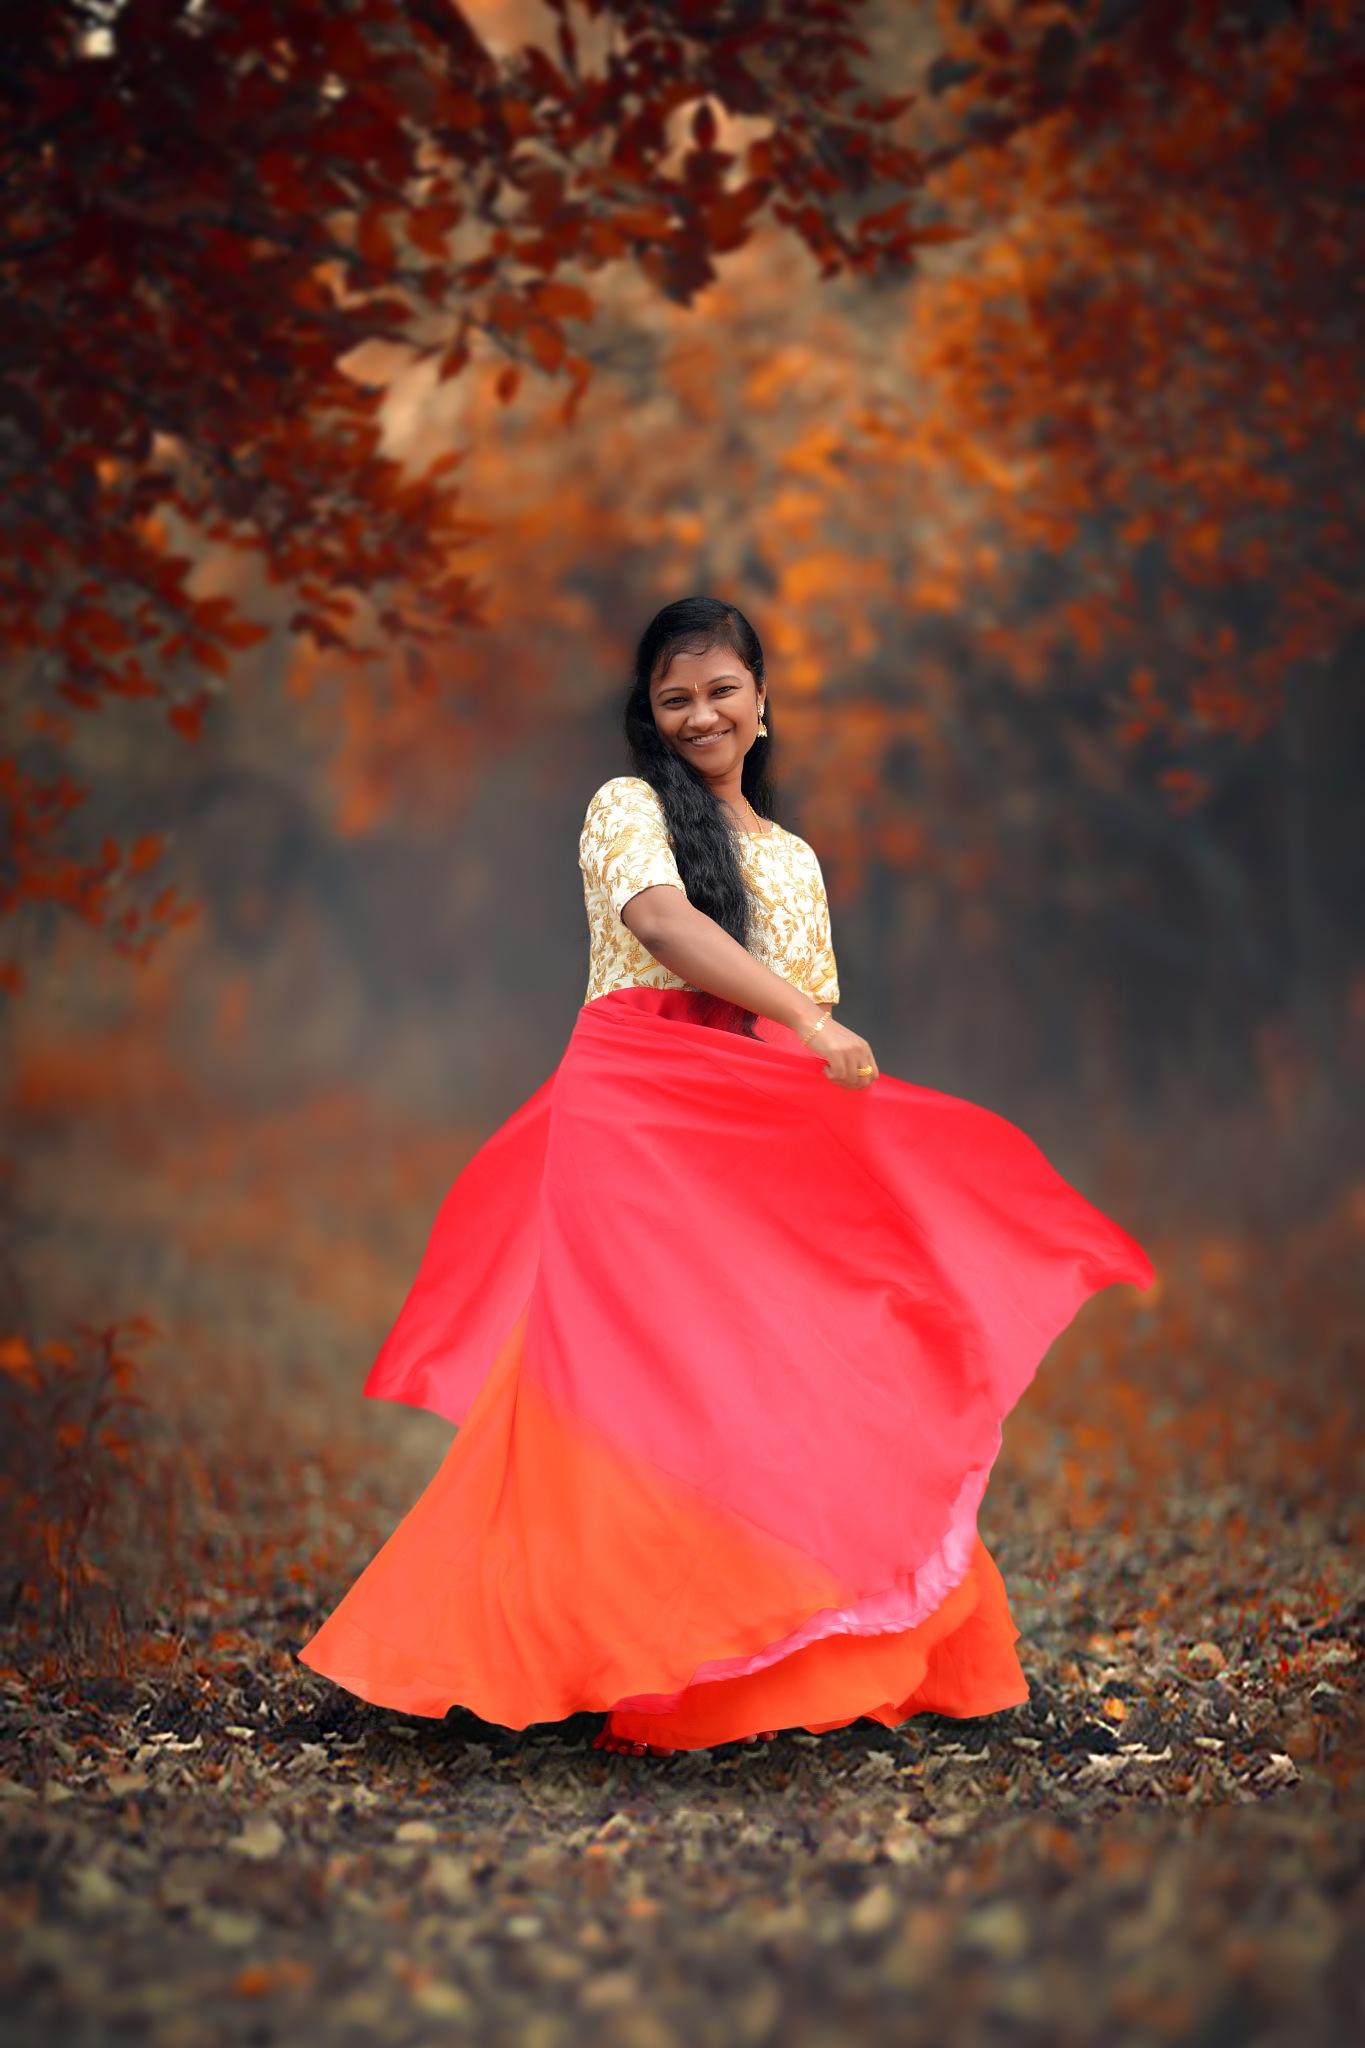 Untitled by Chinna Priyan